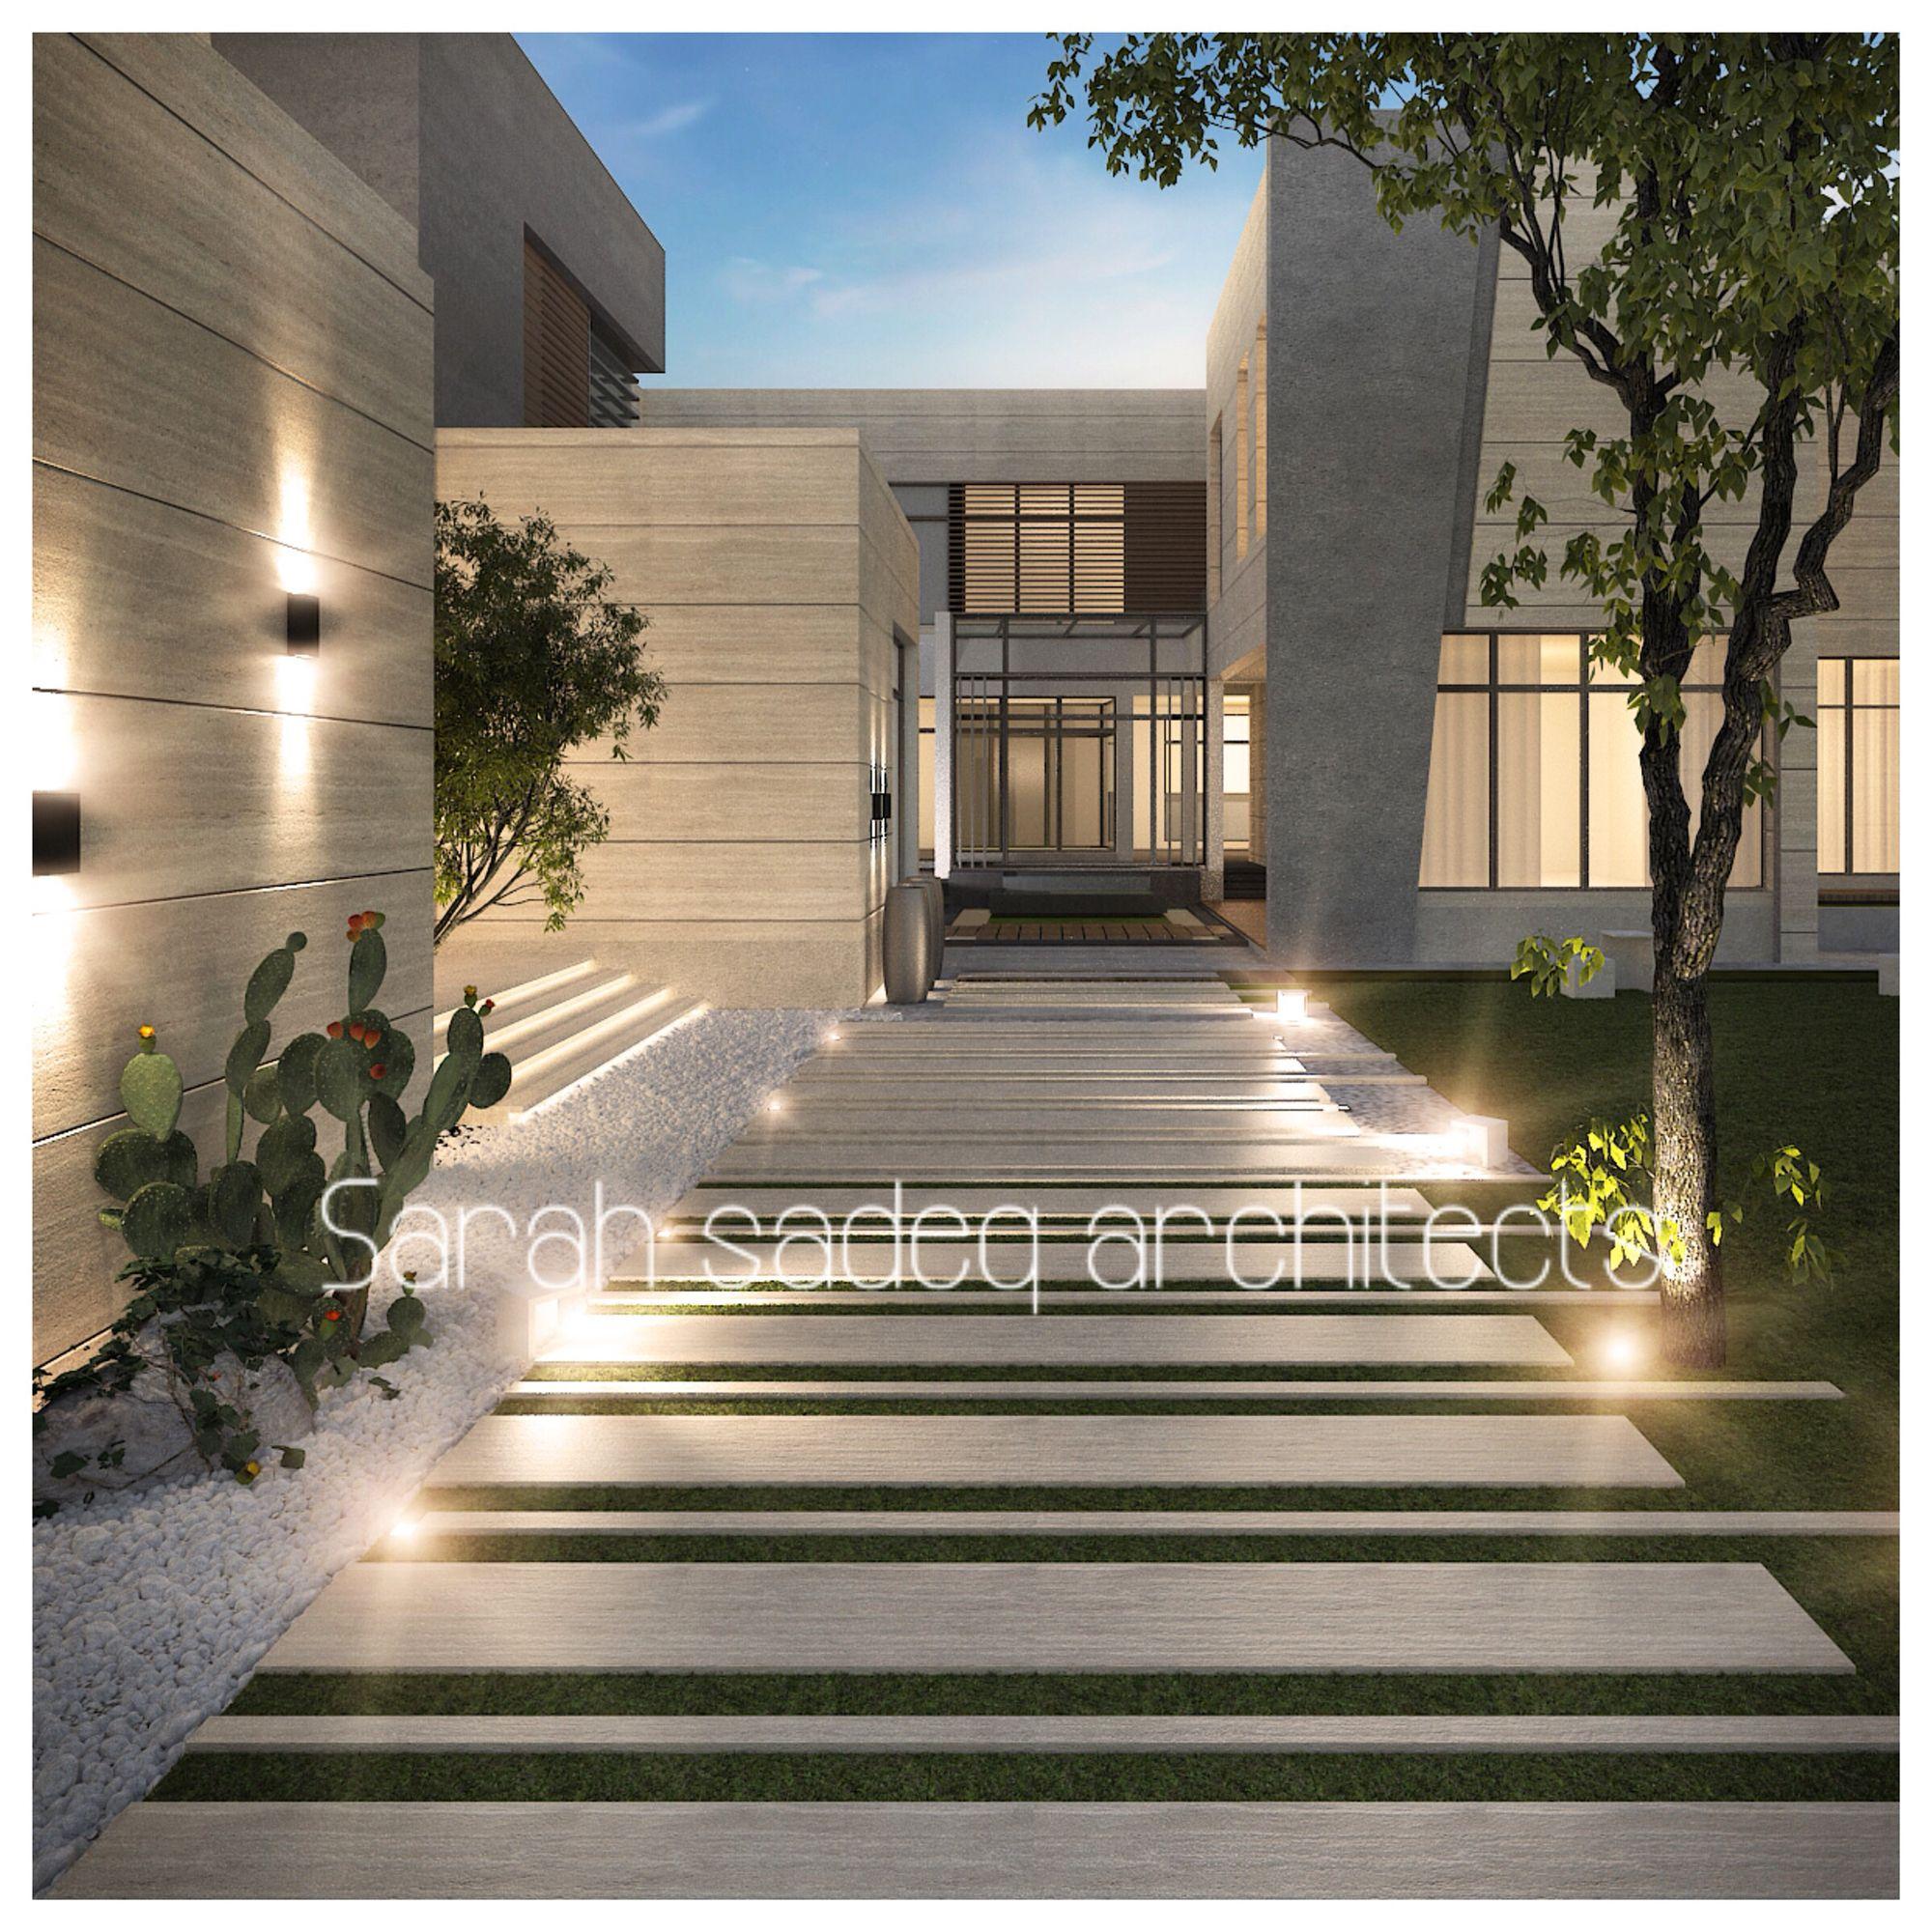 abudahbi landscaping private villa uae by sarah sadeq architects